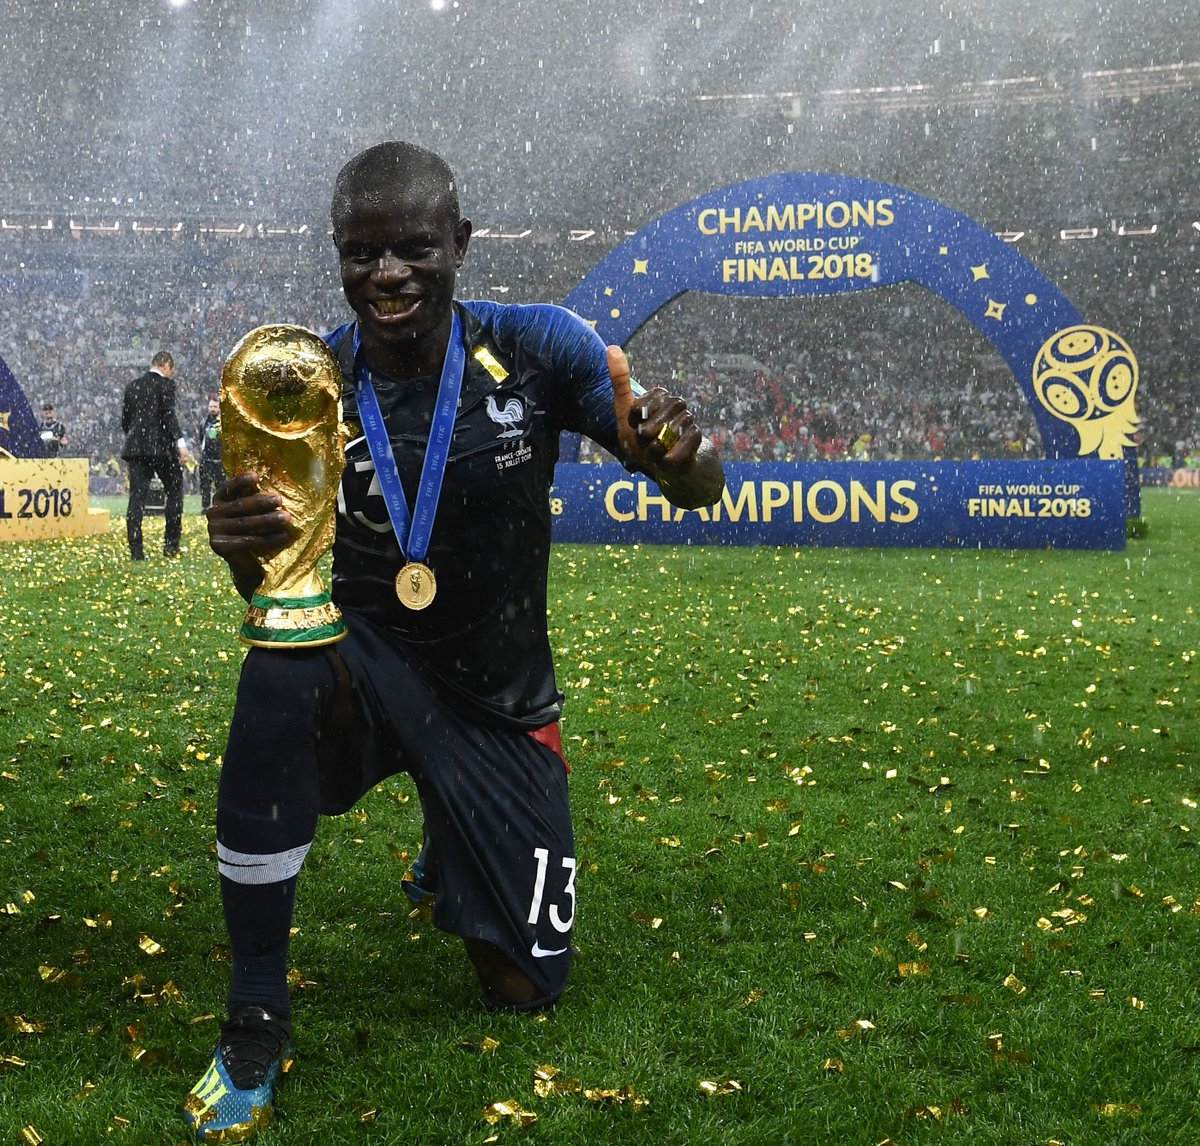 World champions! 🏆 @nglkante @_OlivierGiroud_   #MondayMotivation